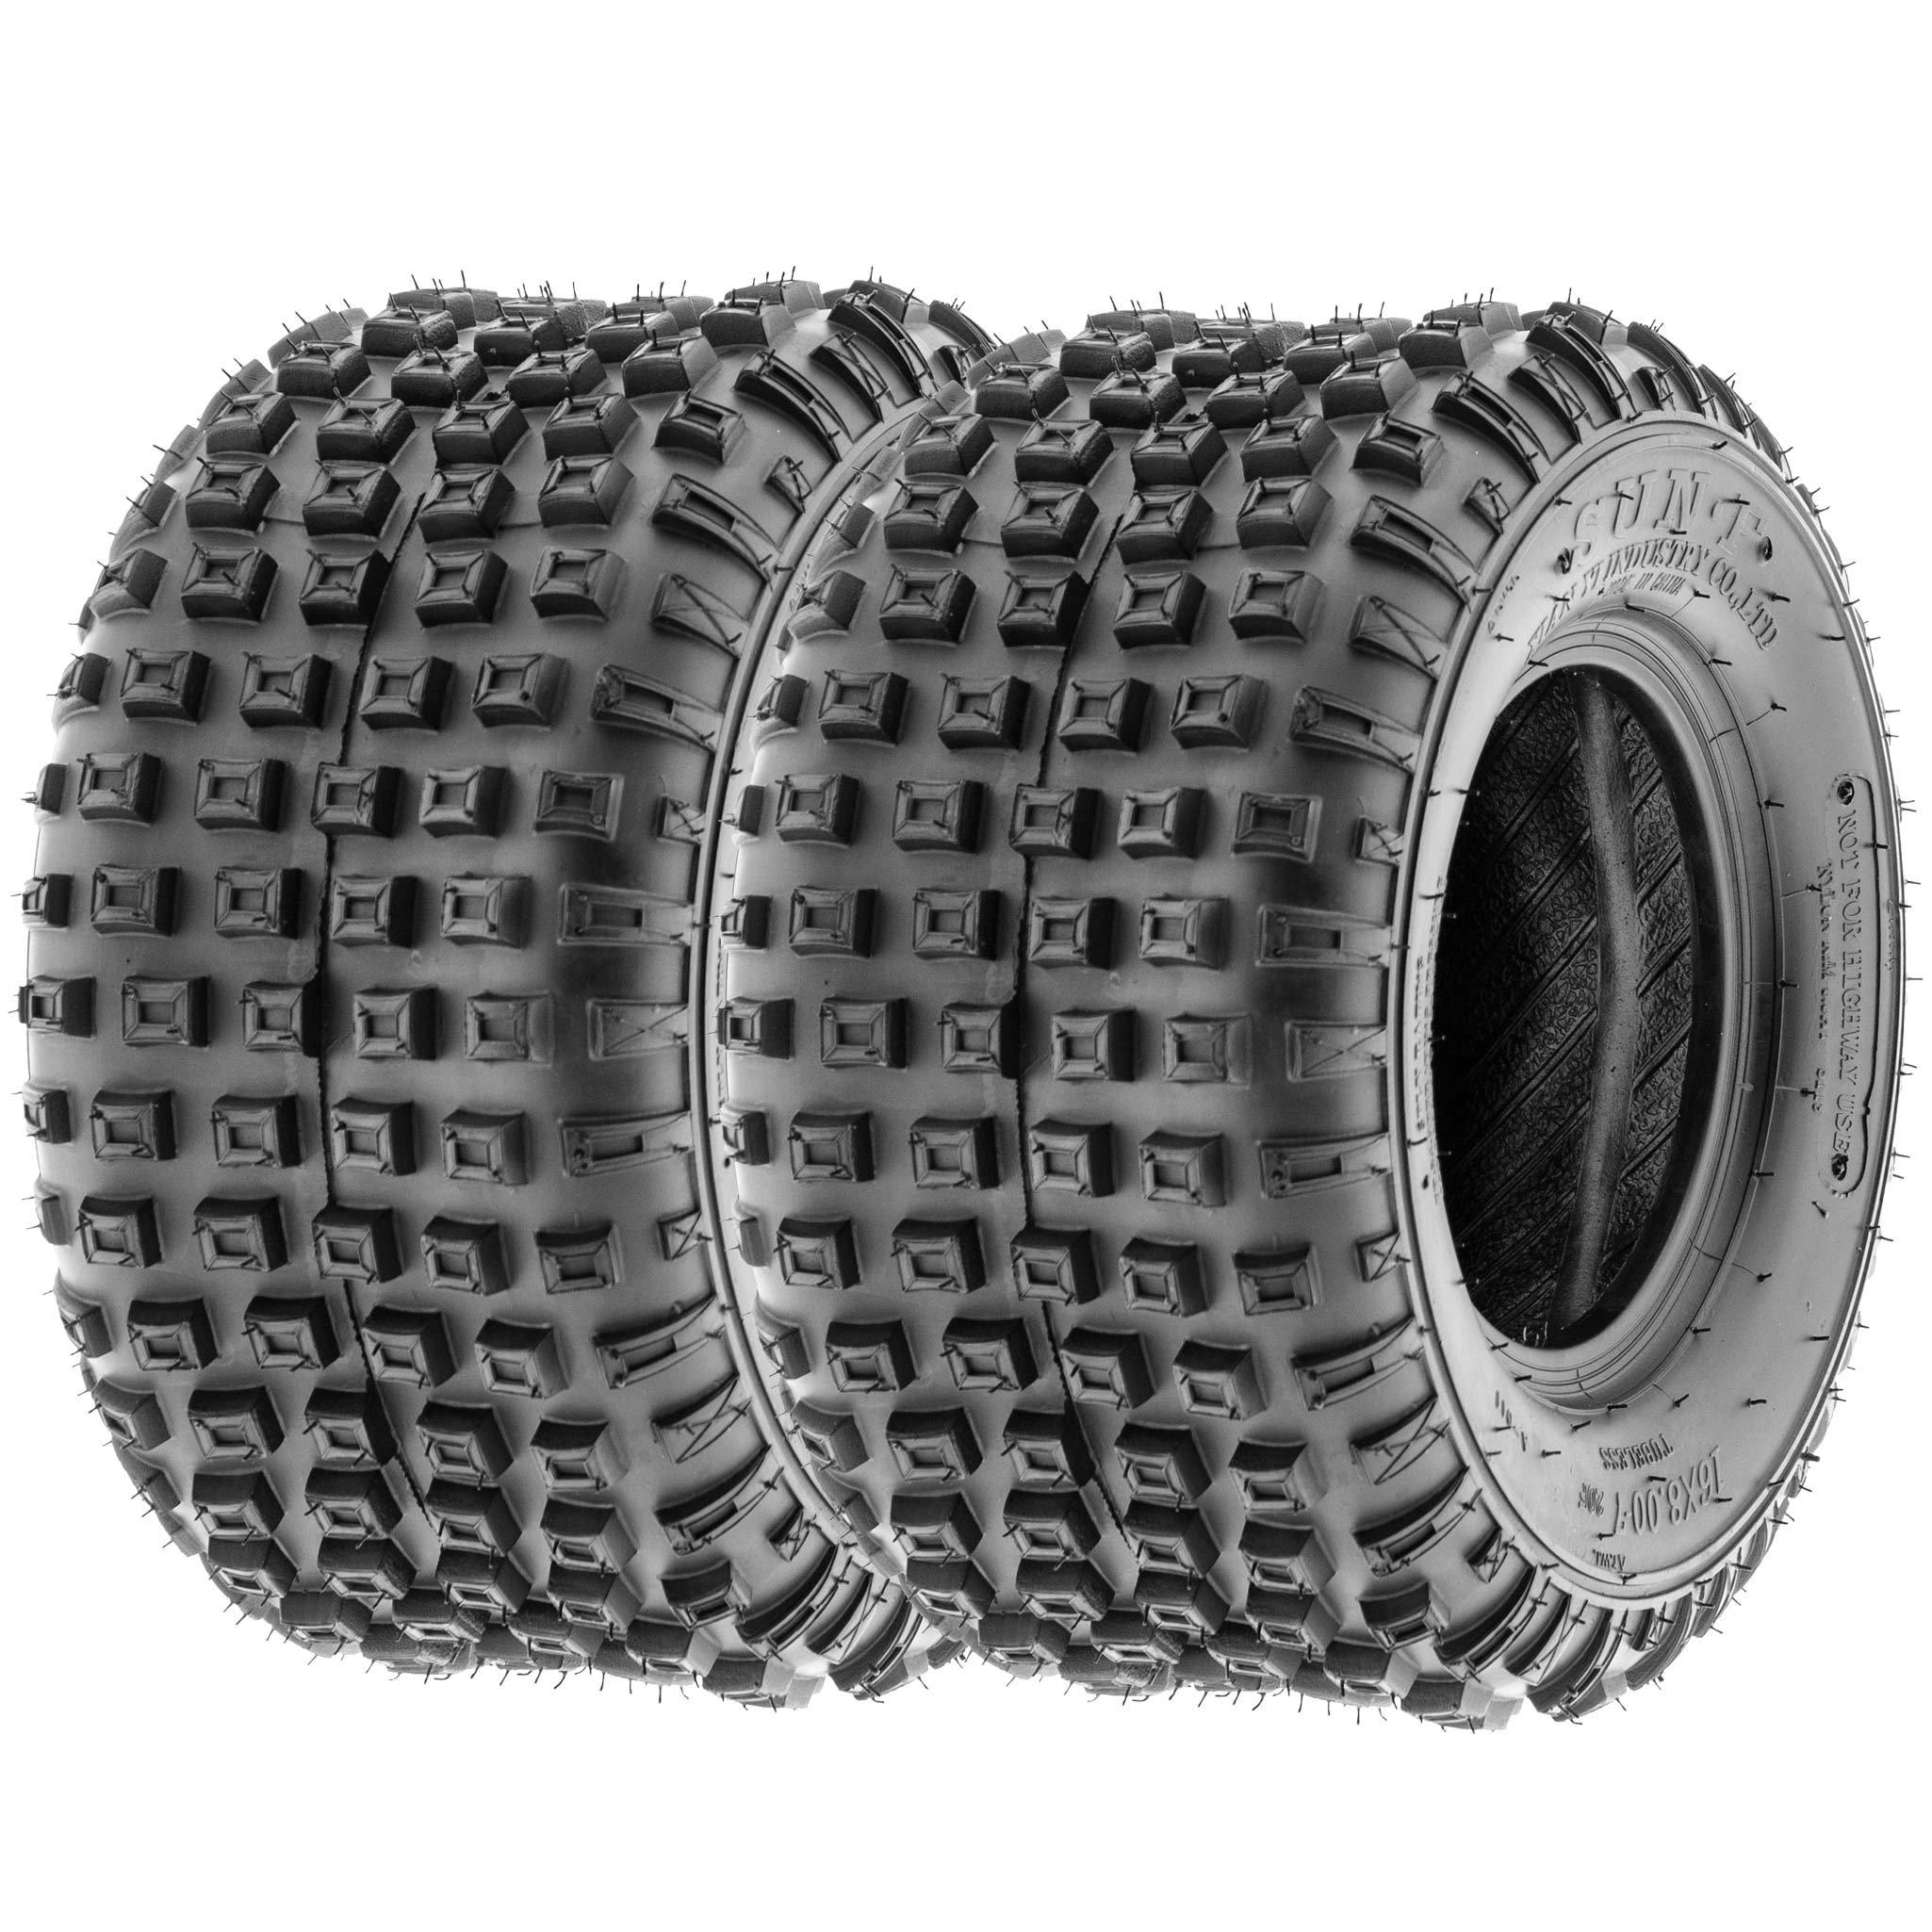 SunF 16x8-7 16x8x7 ATV UTV All Terrain Trail Replacement 6 PR Tubeless Tires A011, [Set of 2]